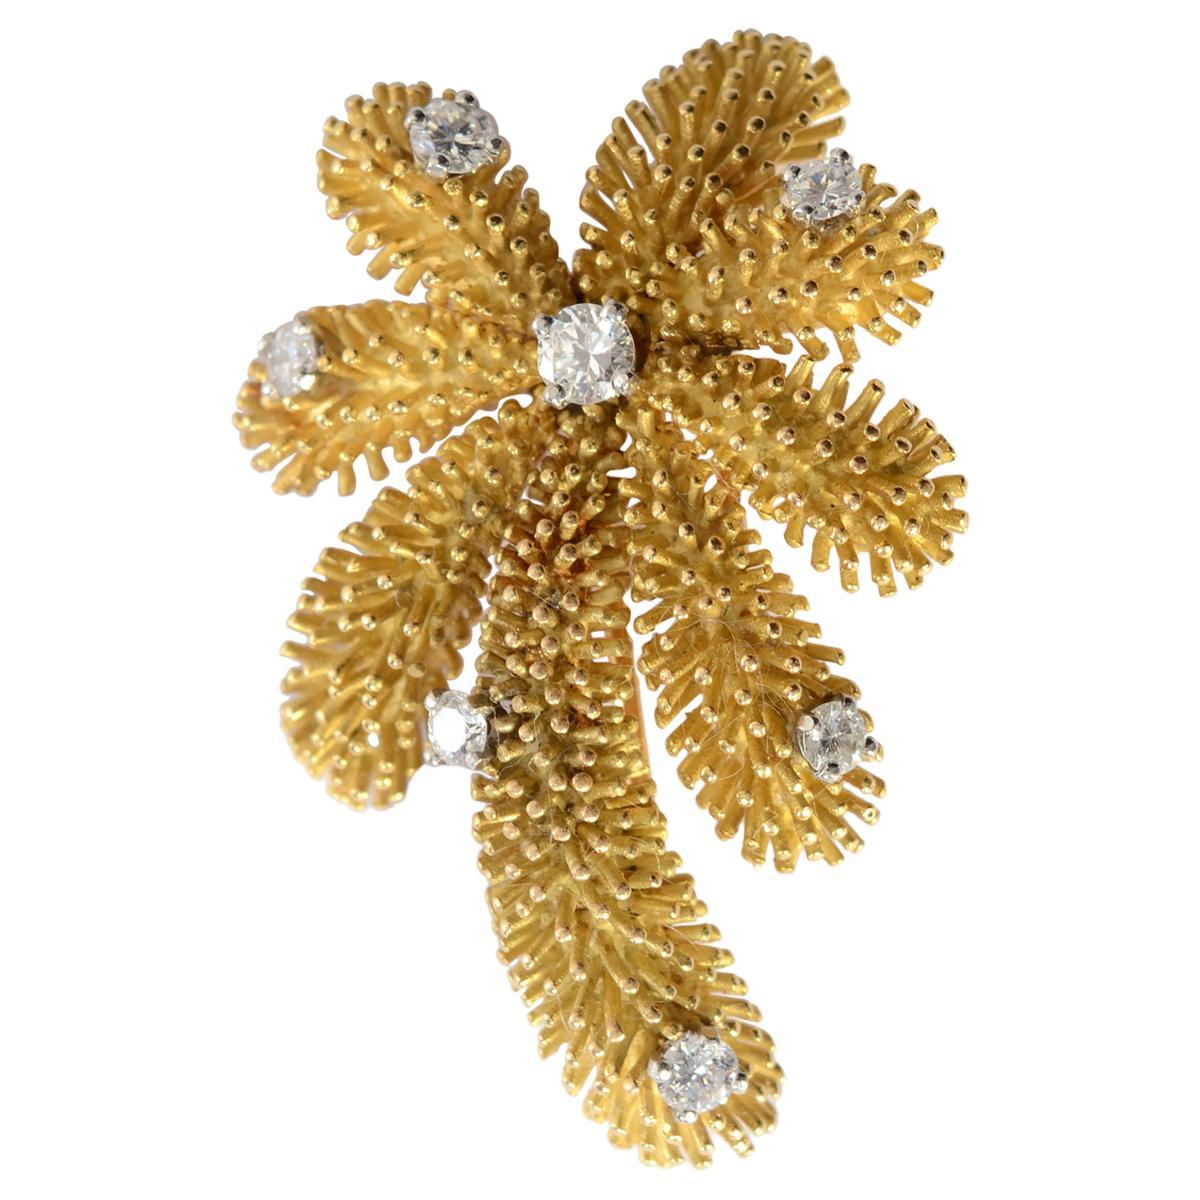 Tiffany & Co. Gold and Diamond Palm Tree Brooch